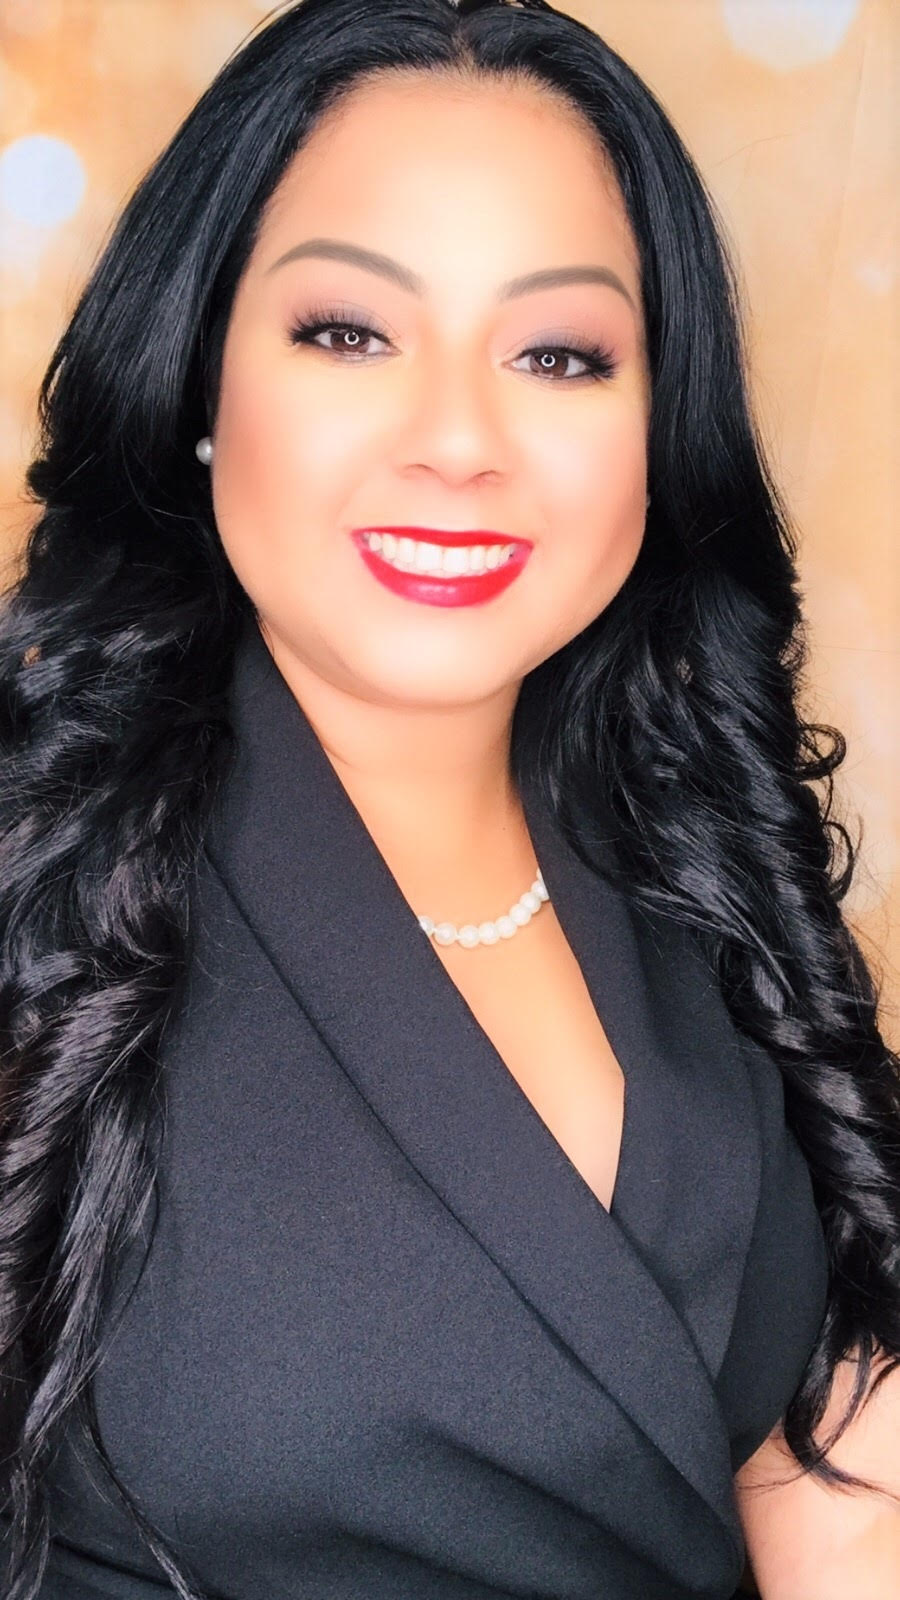 Jacqueline undefined Figueroa